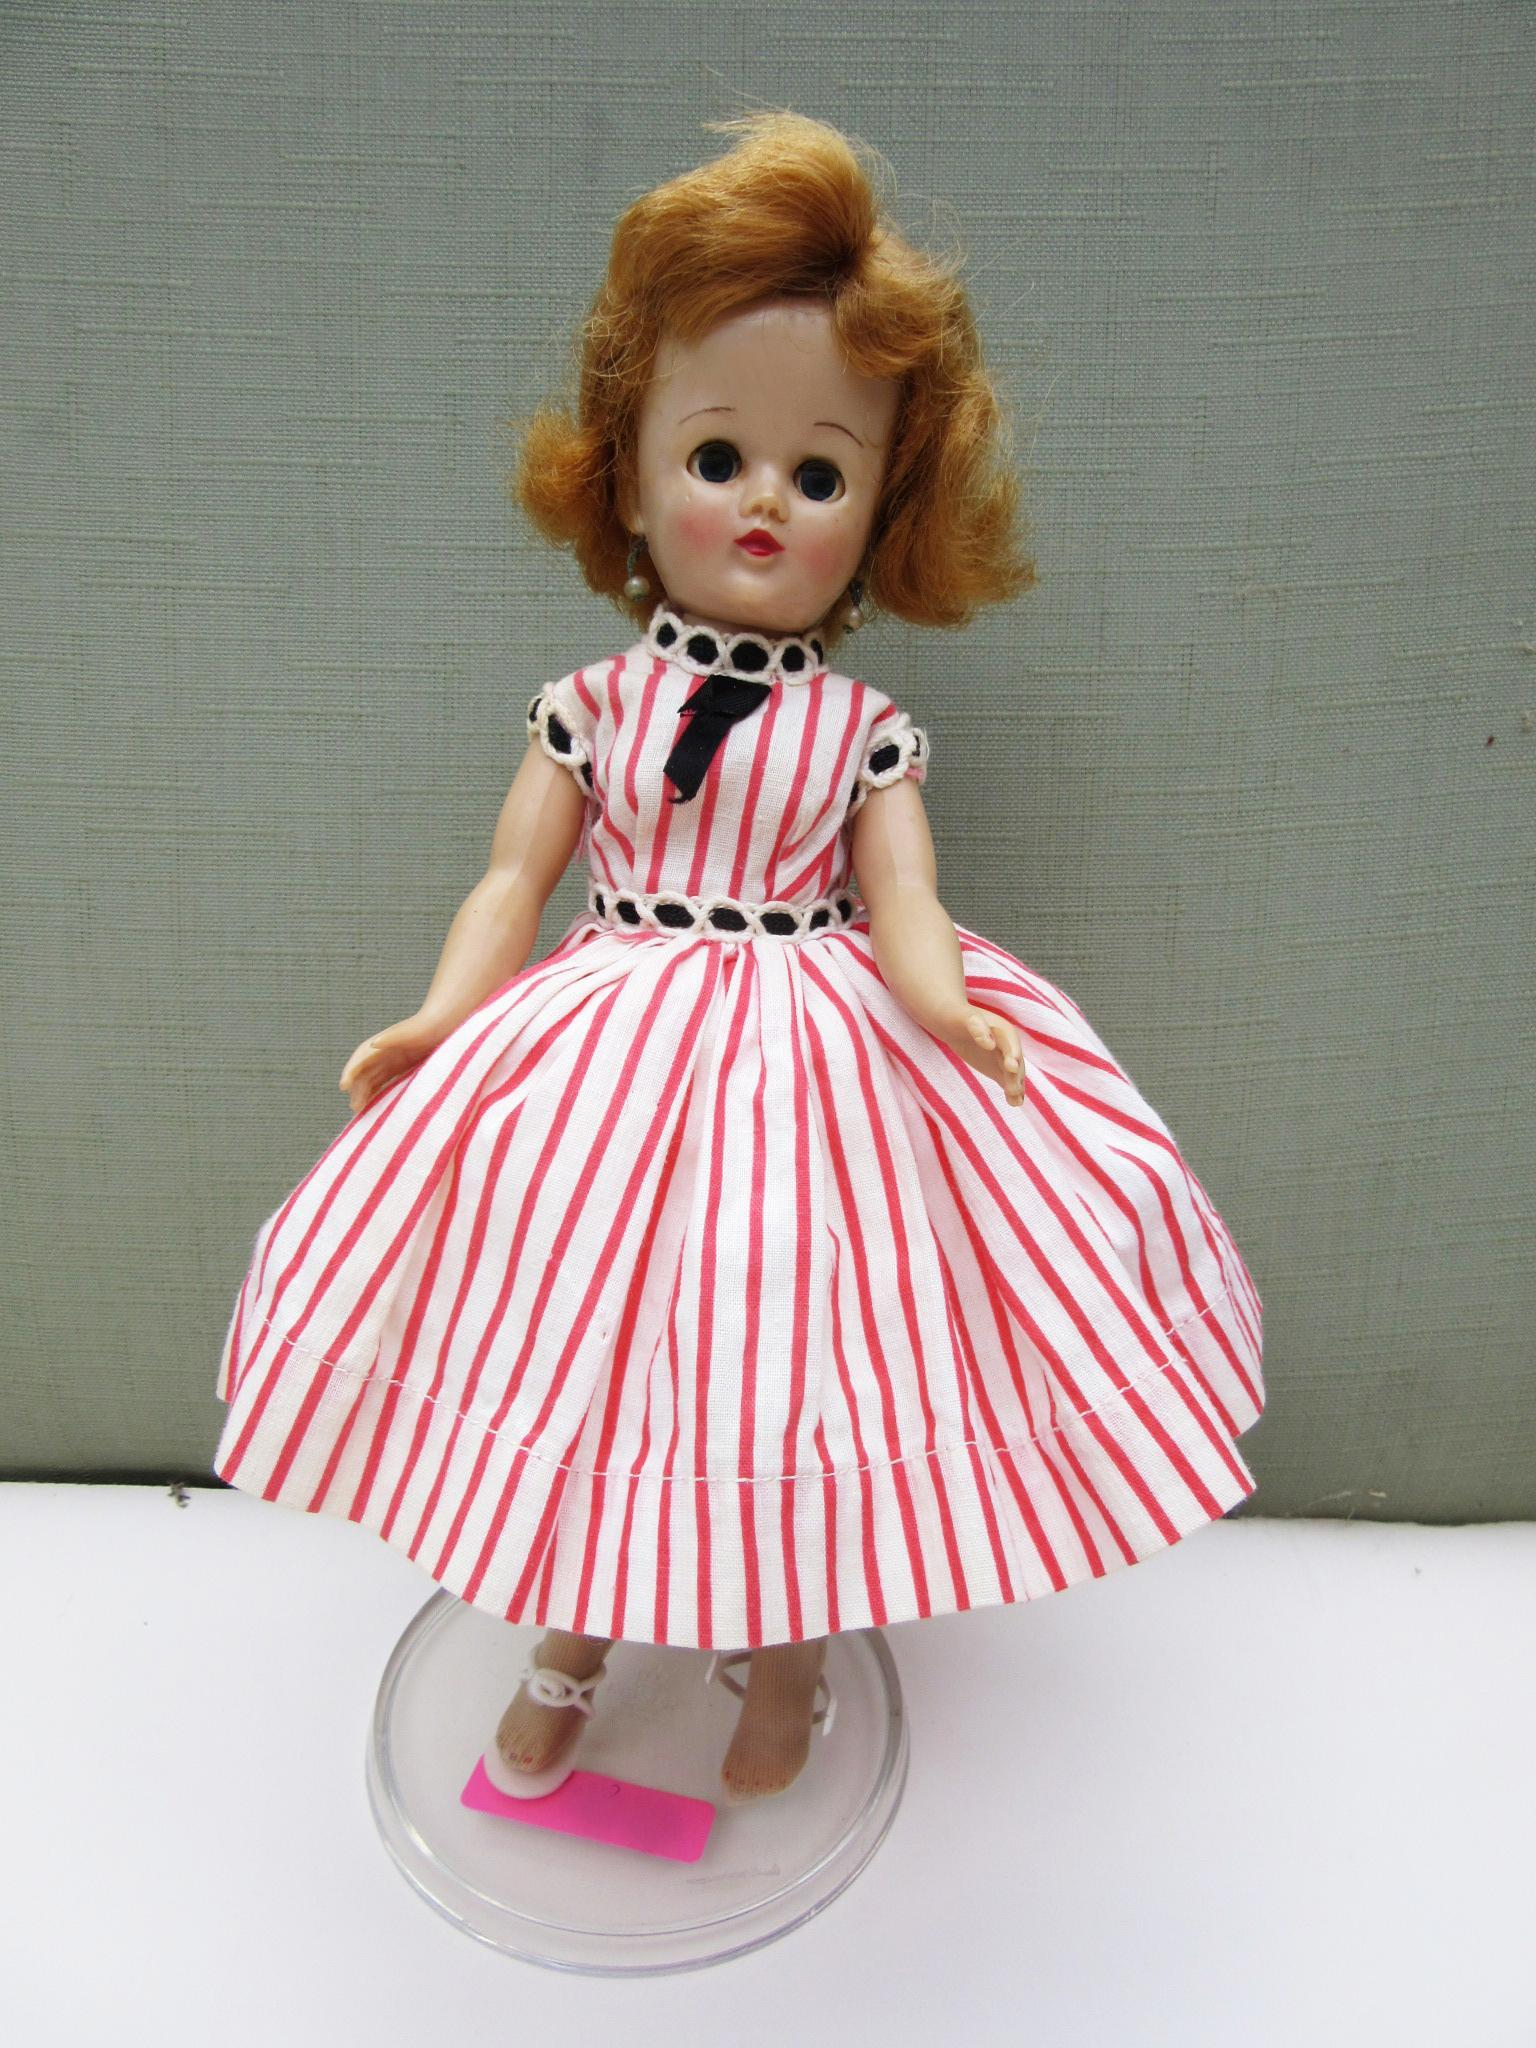 Vogue Jill HP in Original Outfit